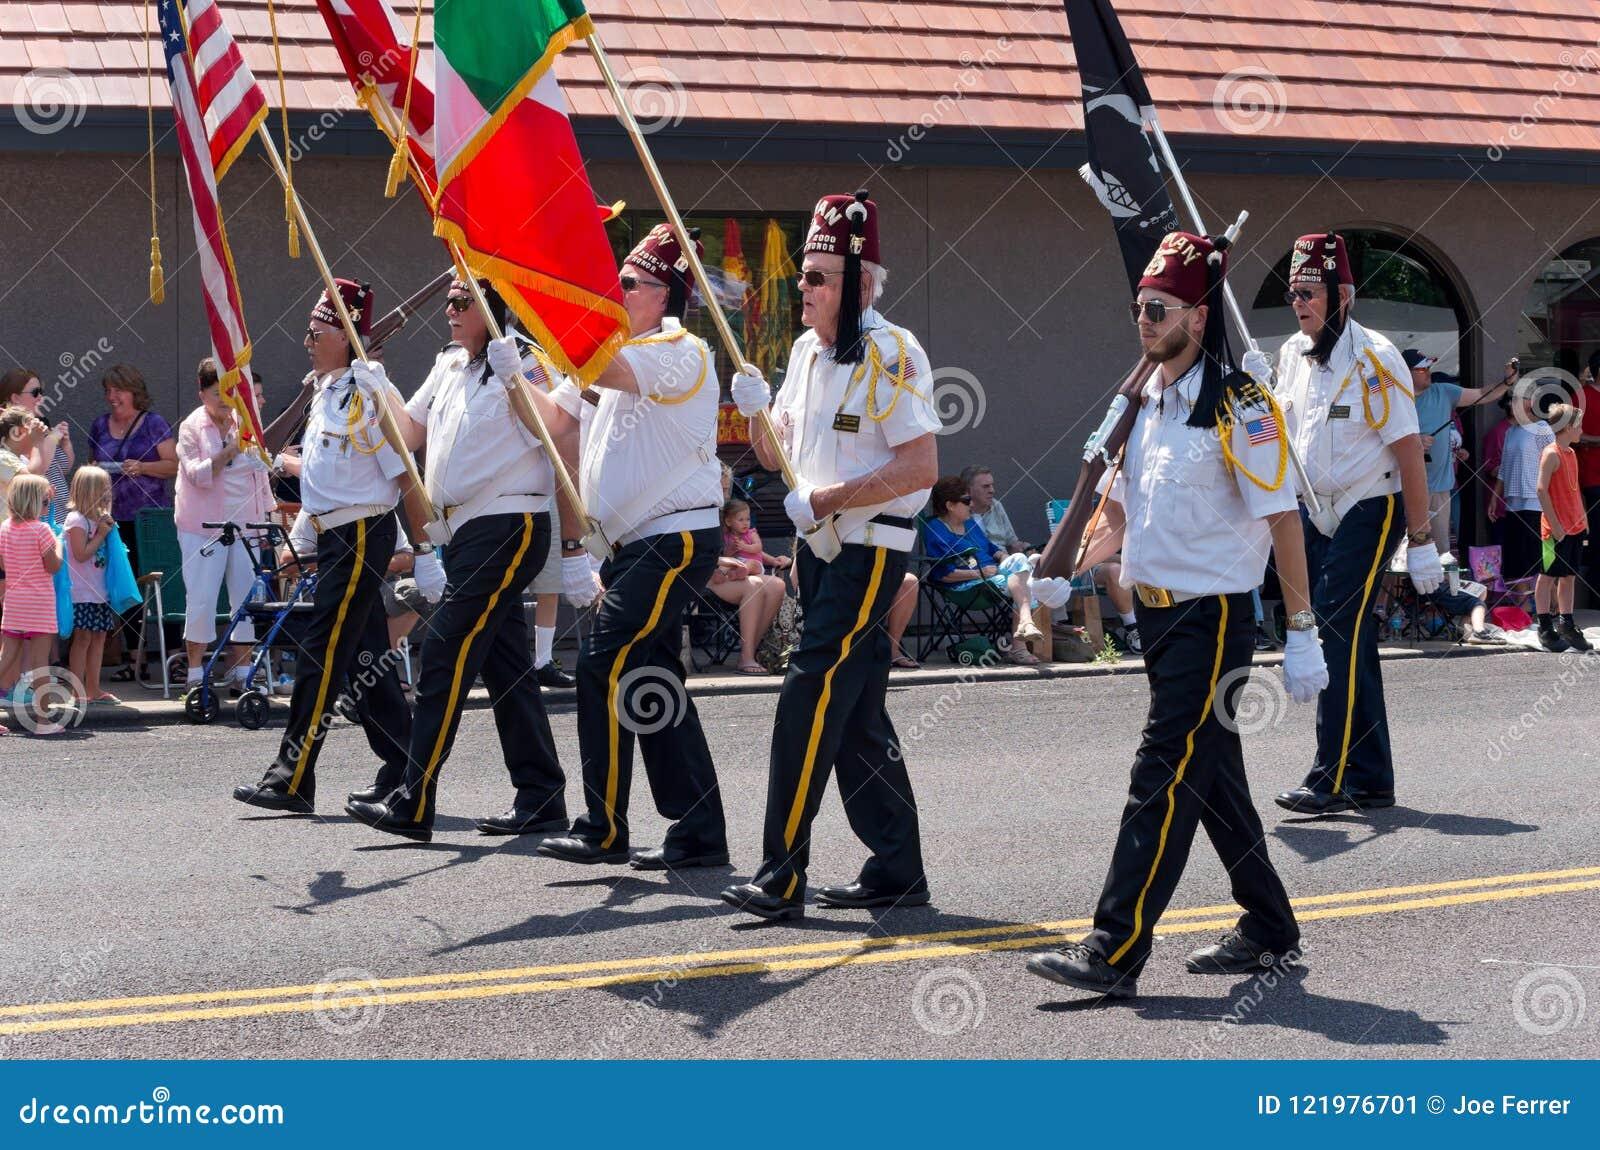 Shriners March at Mendota Parade